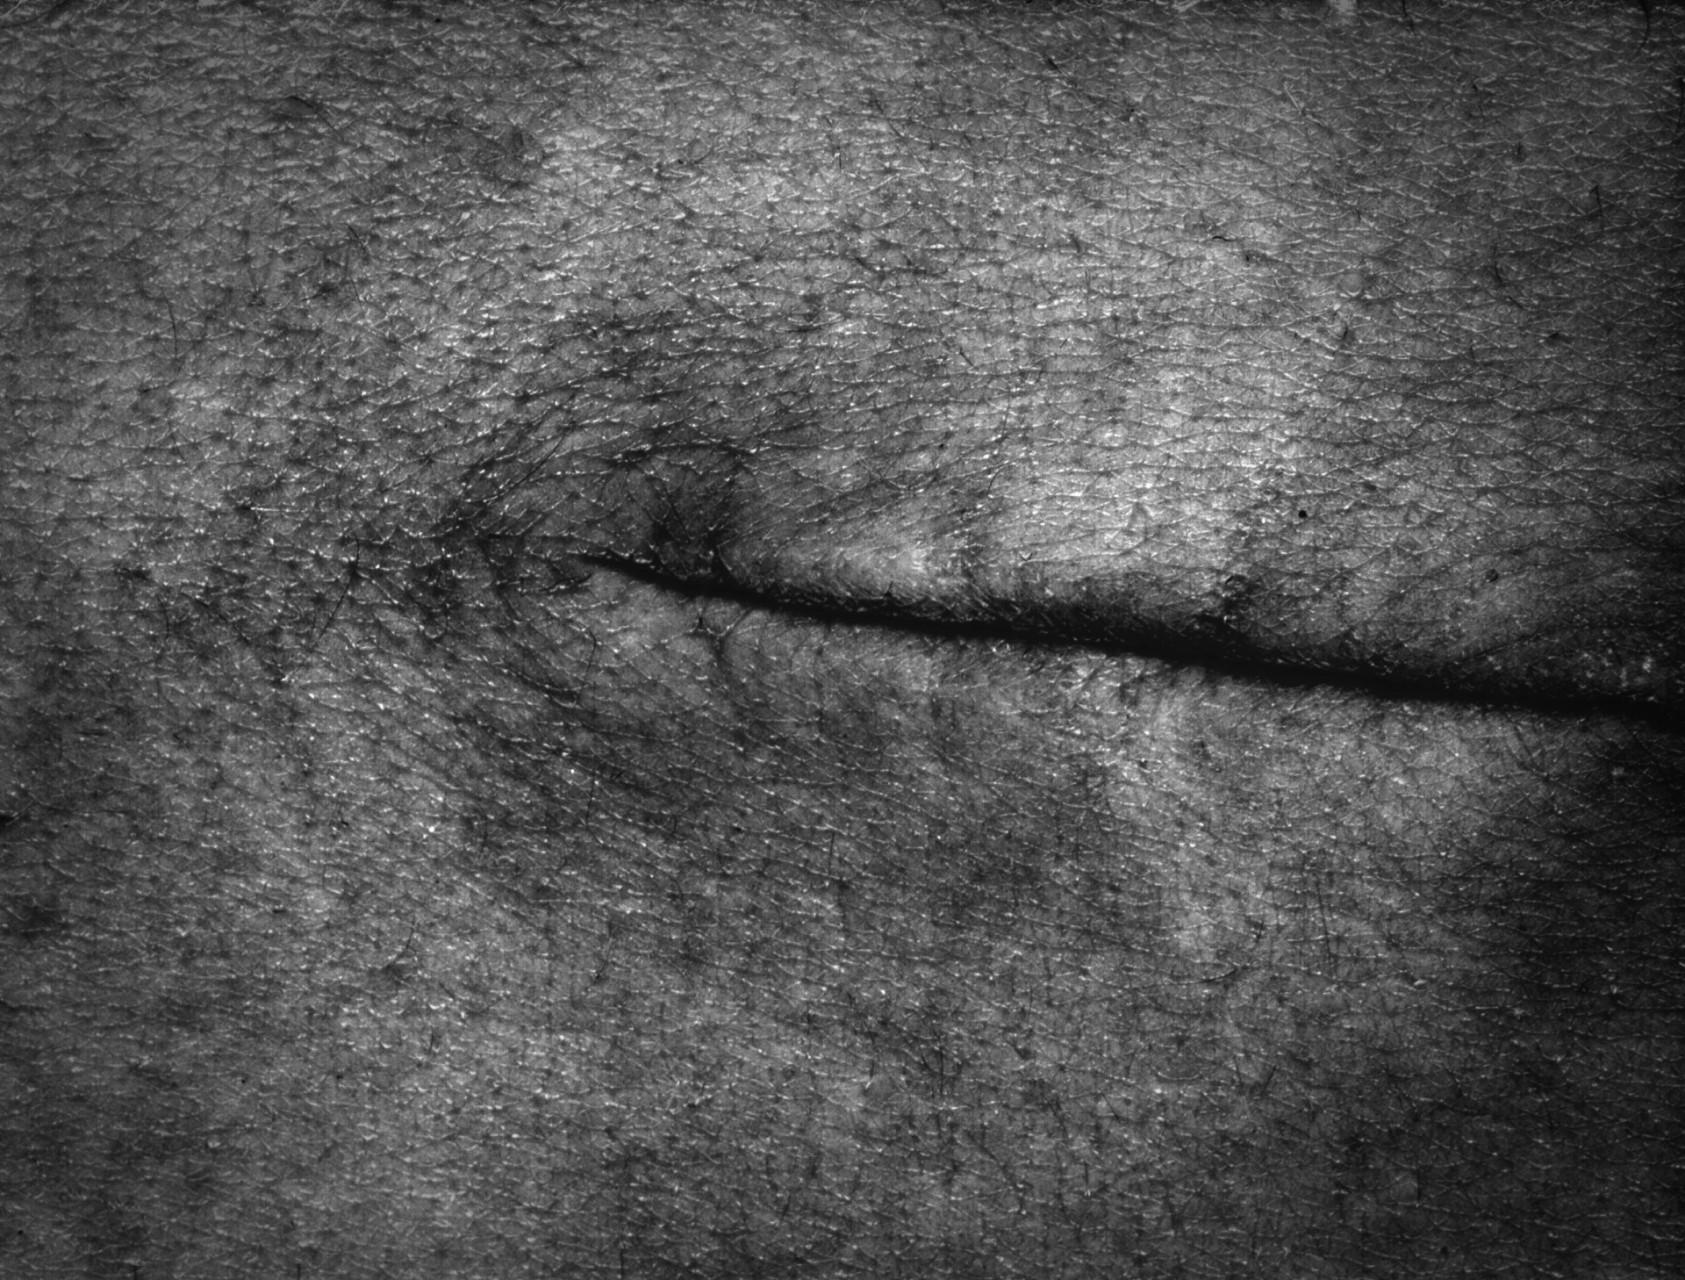 Skin scans